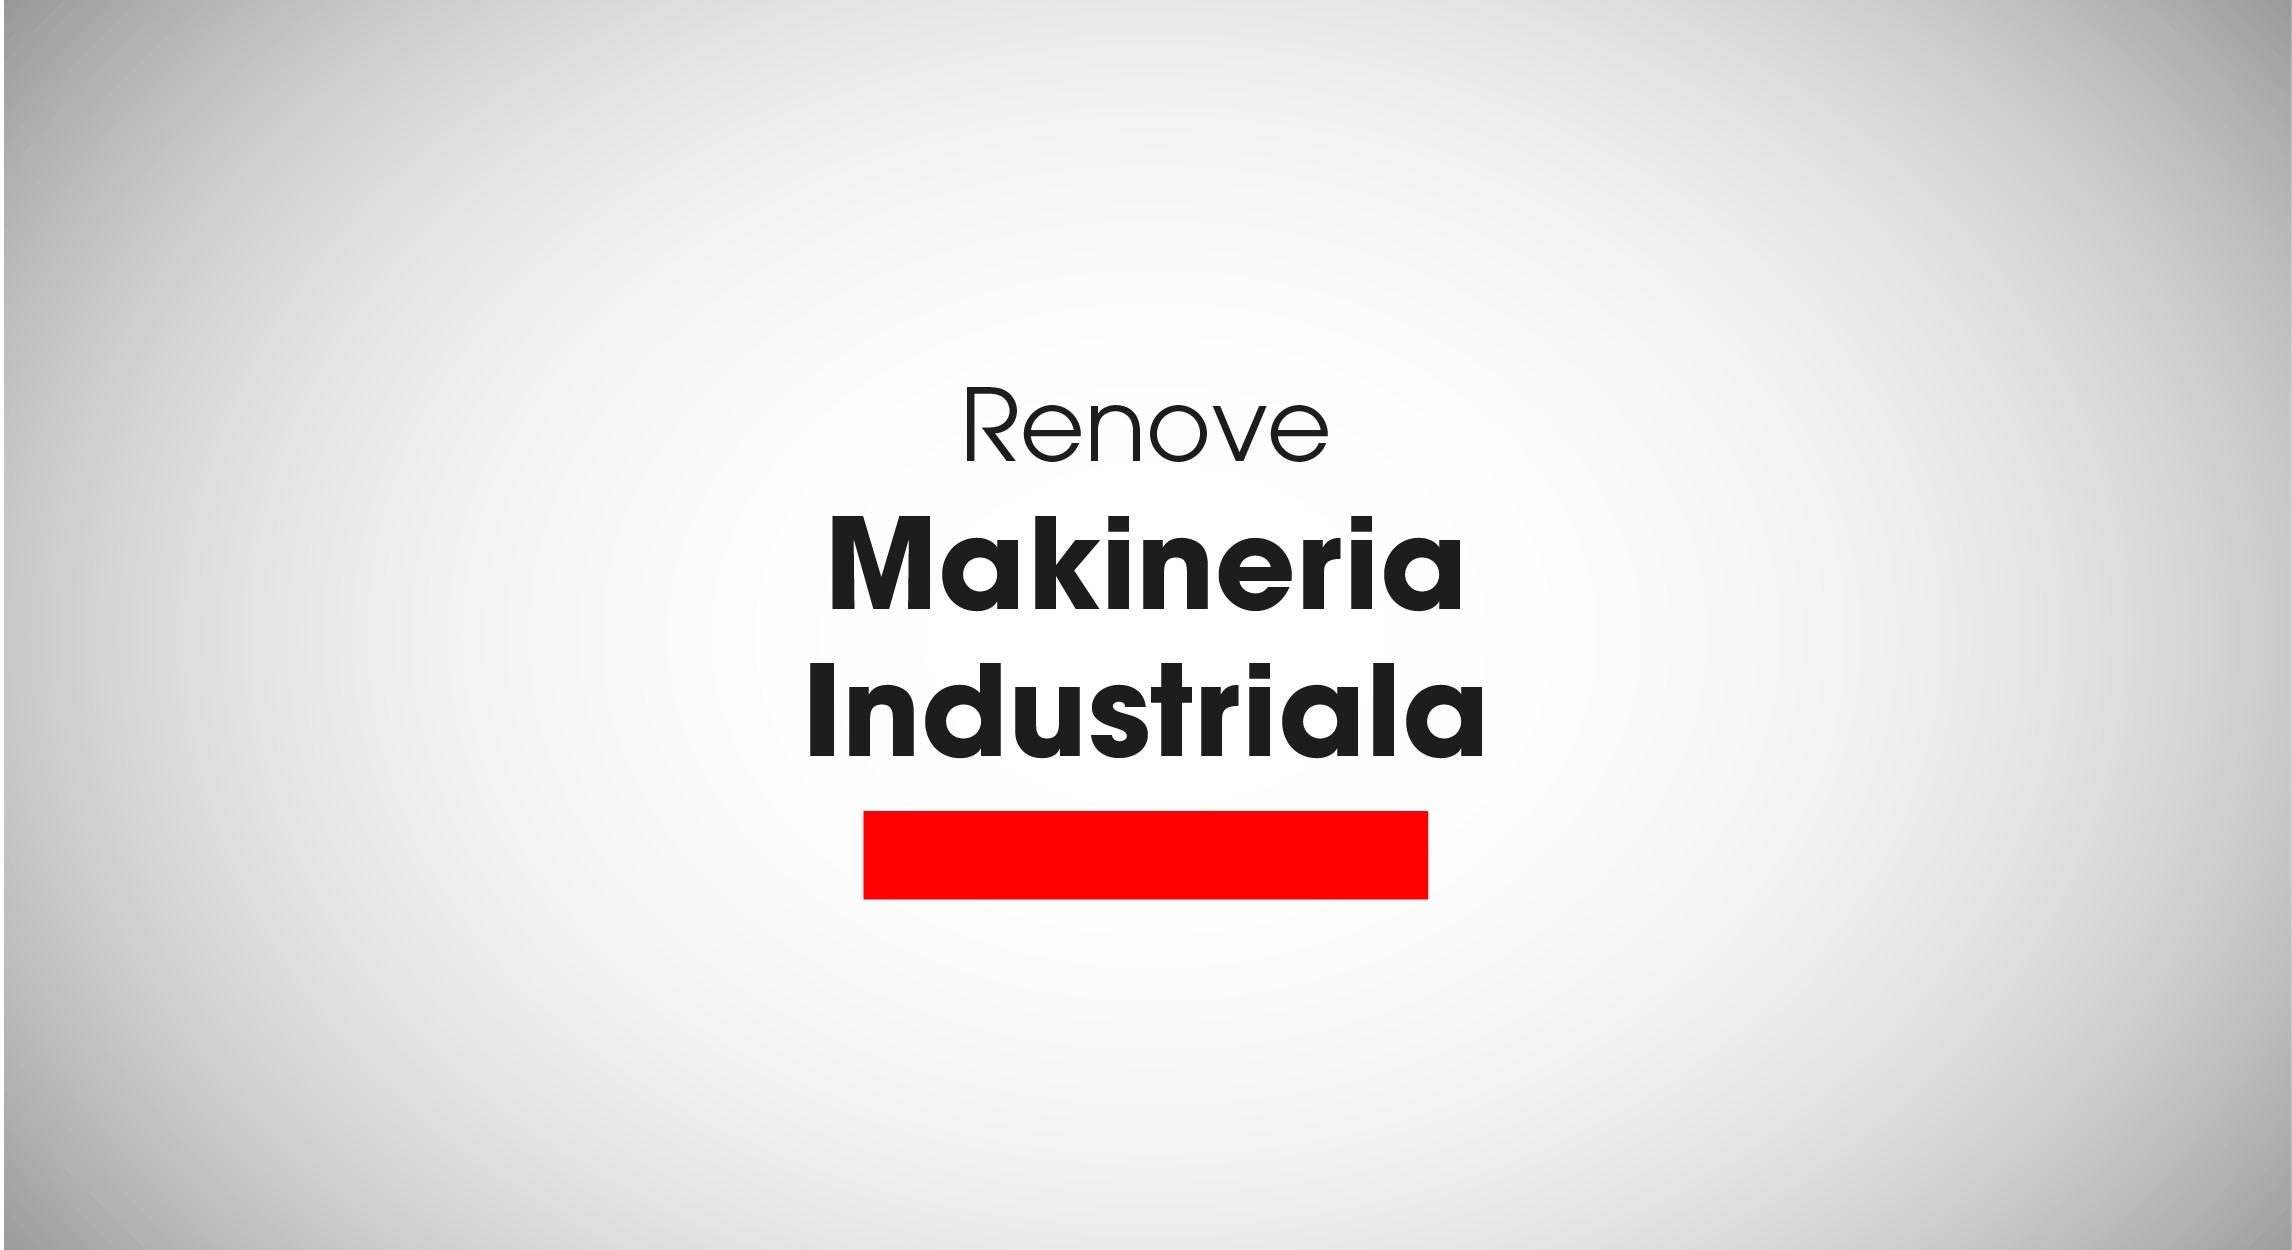 renove_makineria_industriala.jpg